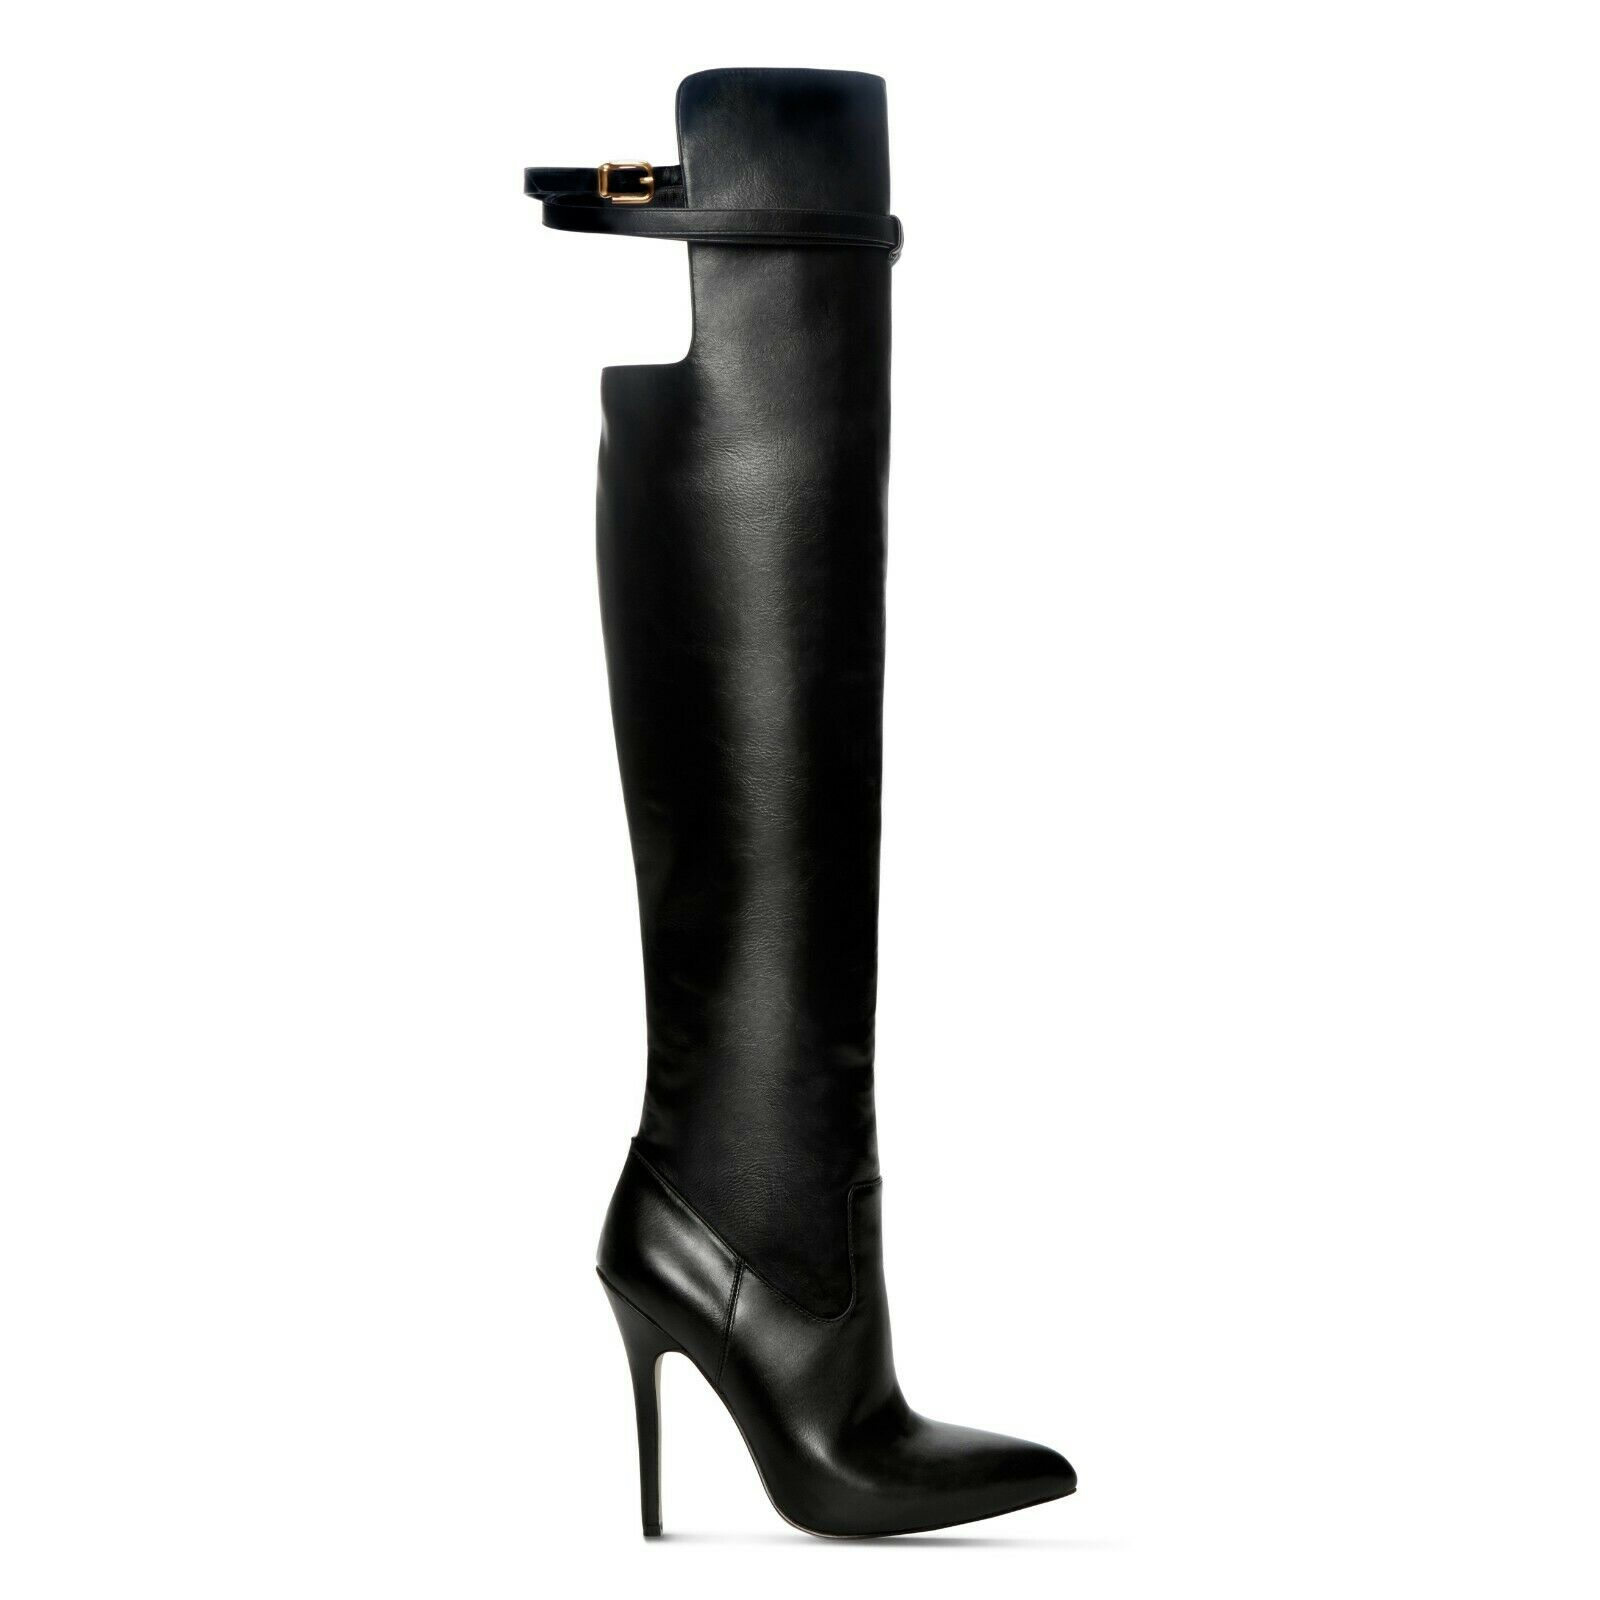 Altuzarra Tiras Negro Tacón Stiletto botas Mujer US 7 Eu 37